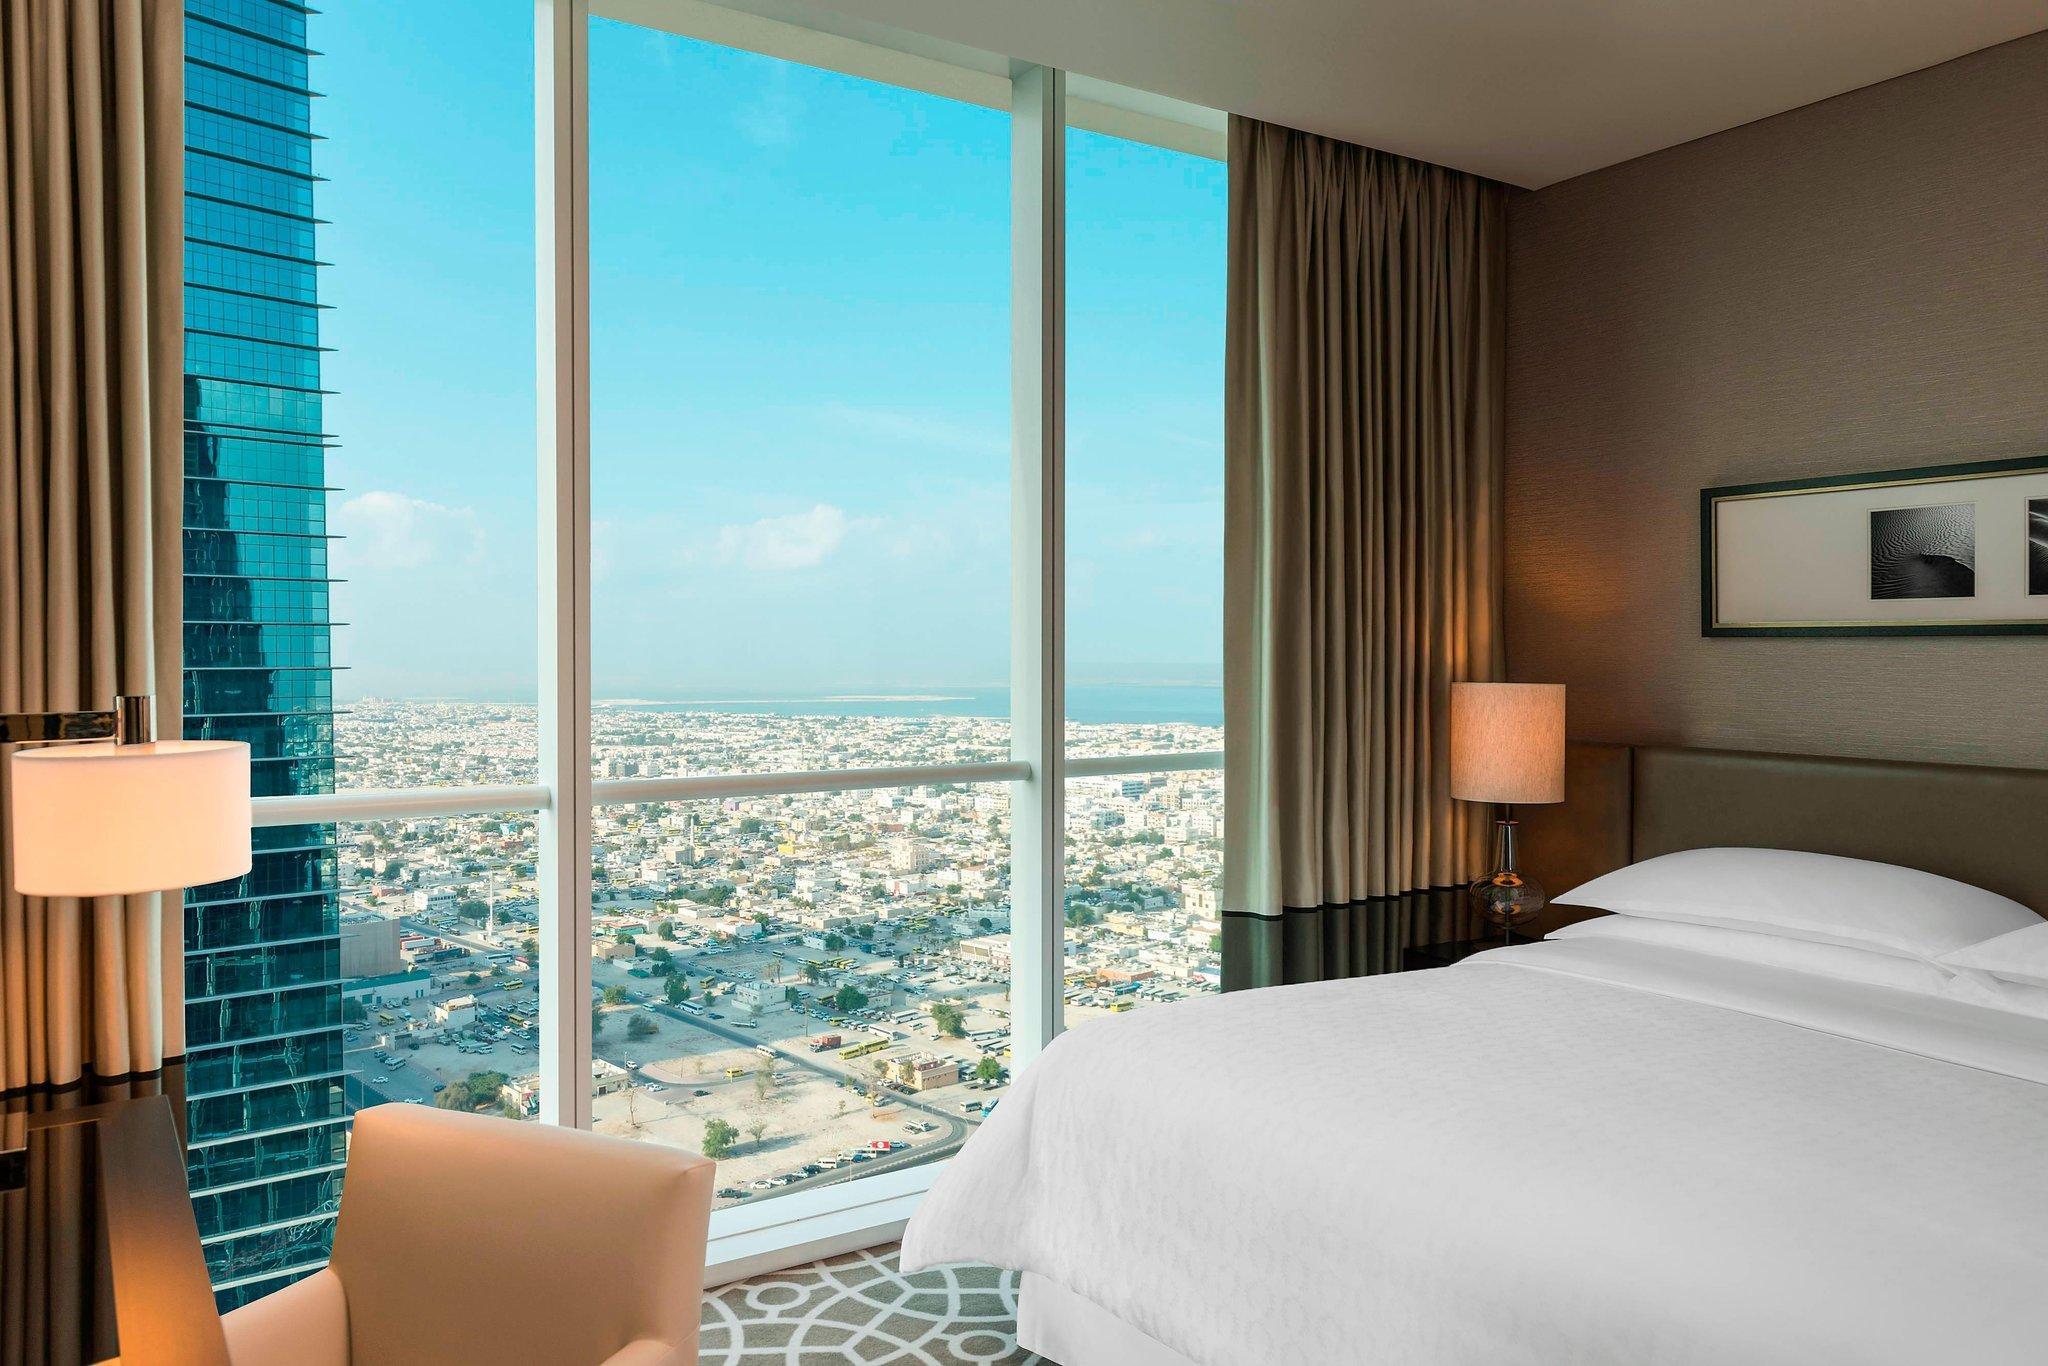 Sheraton Grand Hotel Dubai In United Arab Emirates Room Deals Photos Reviews